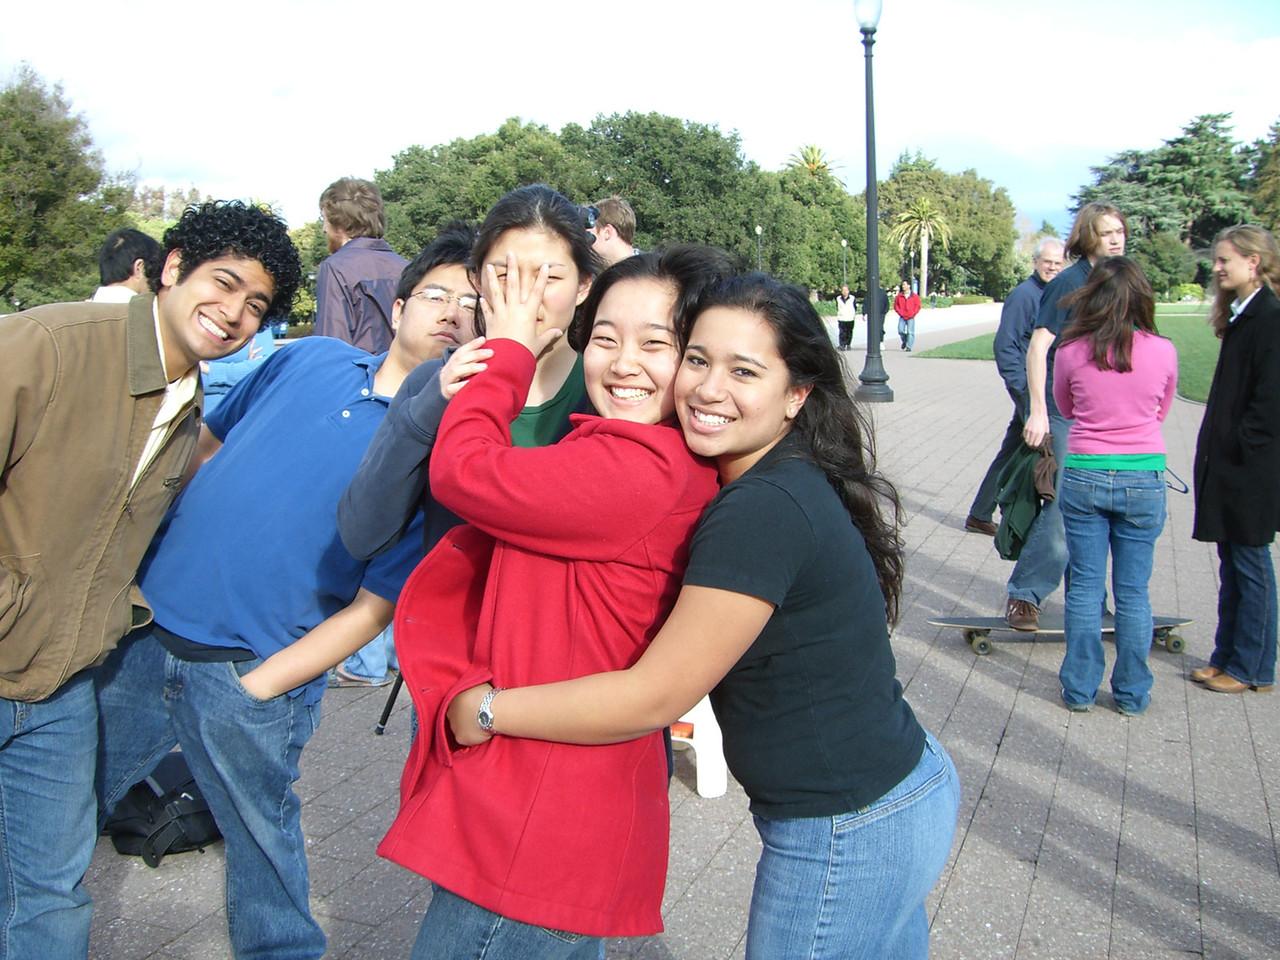 2006 03 12 Sun - Pablo Pozo, David Chiang, Jenn Kim, Esther Kang, & Jennifer Evans